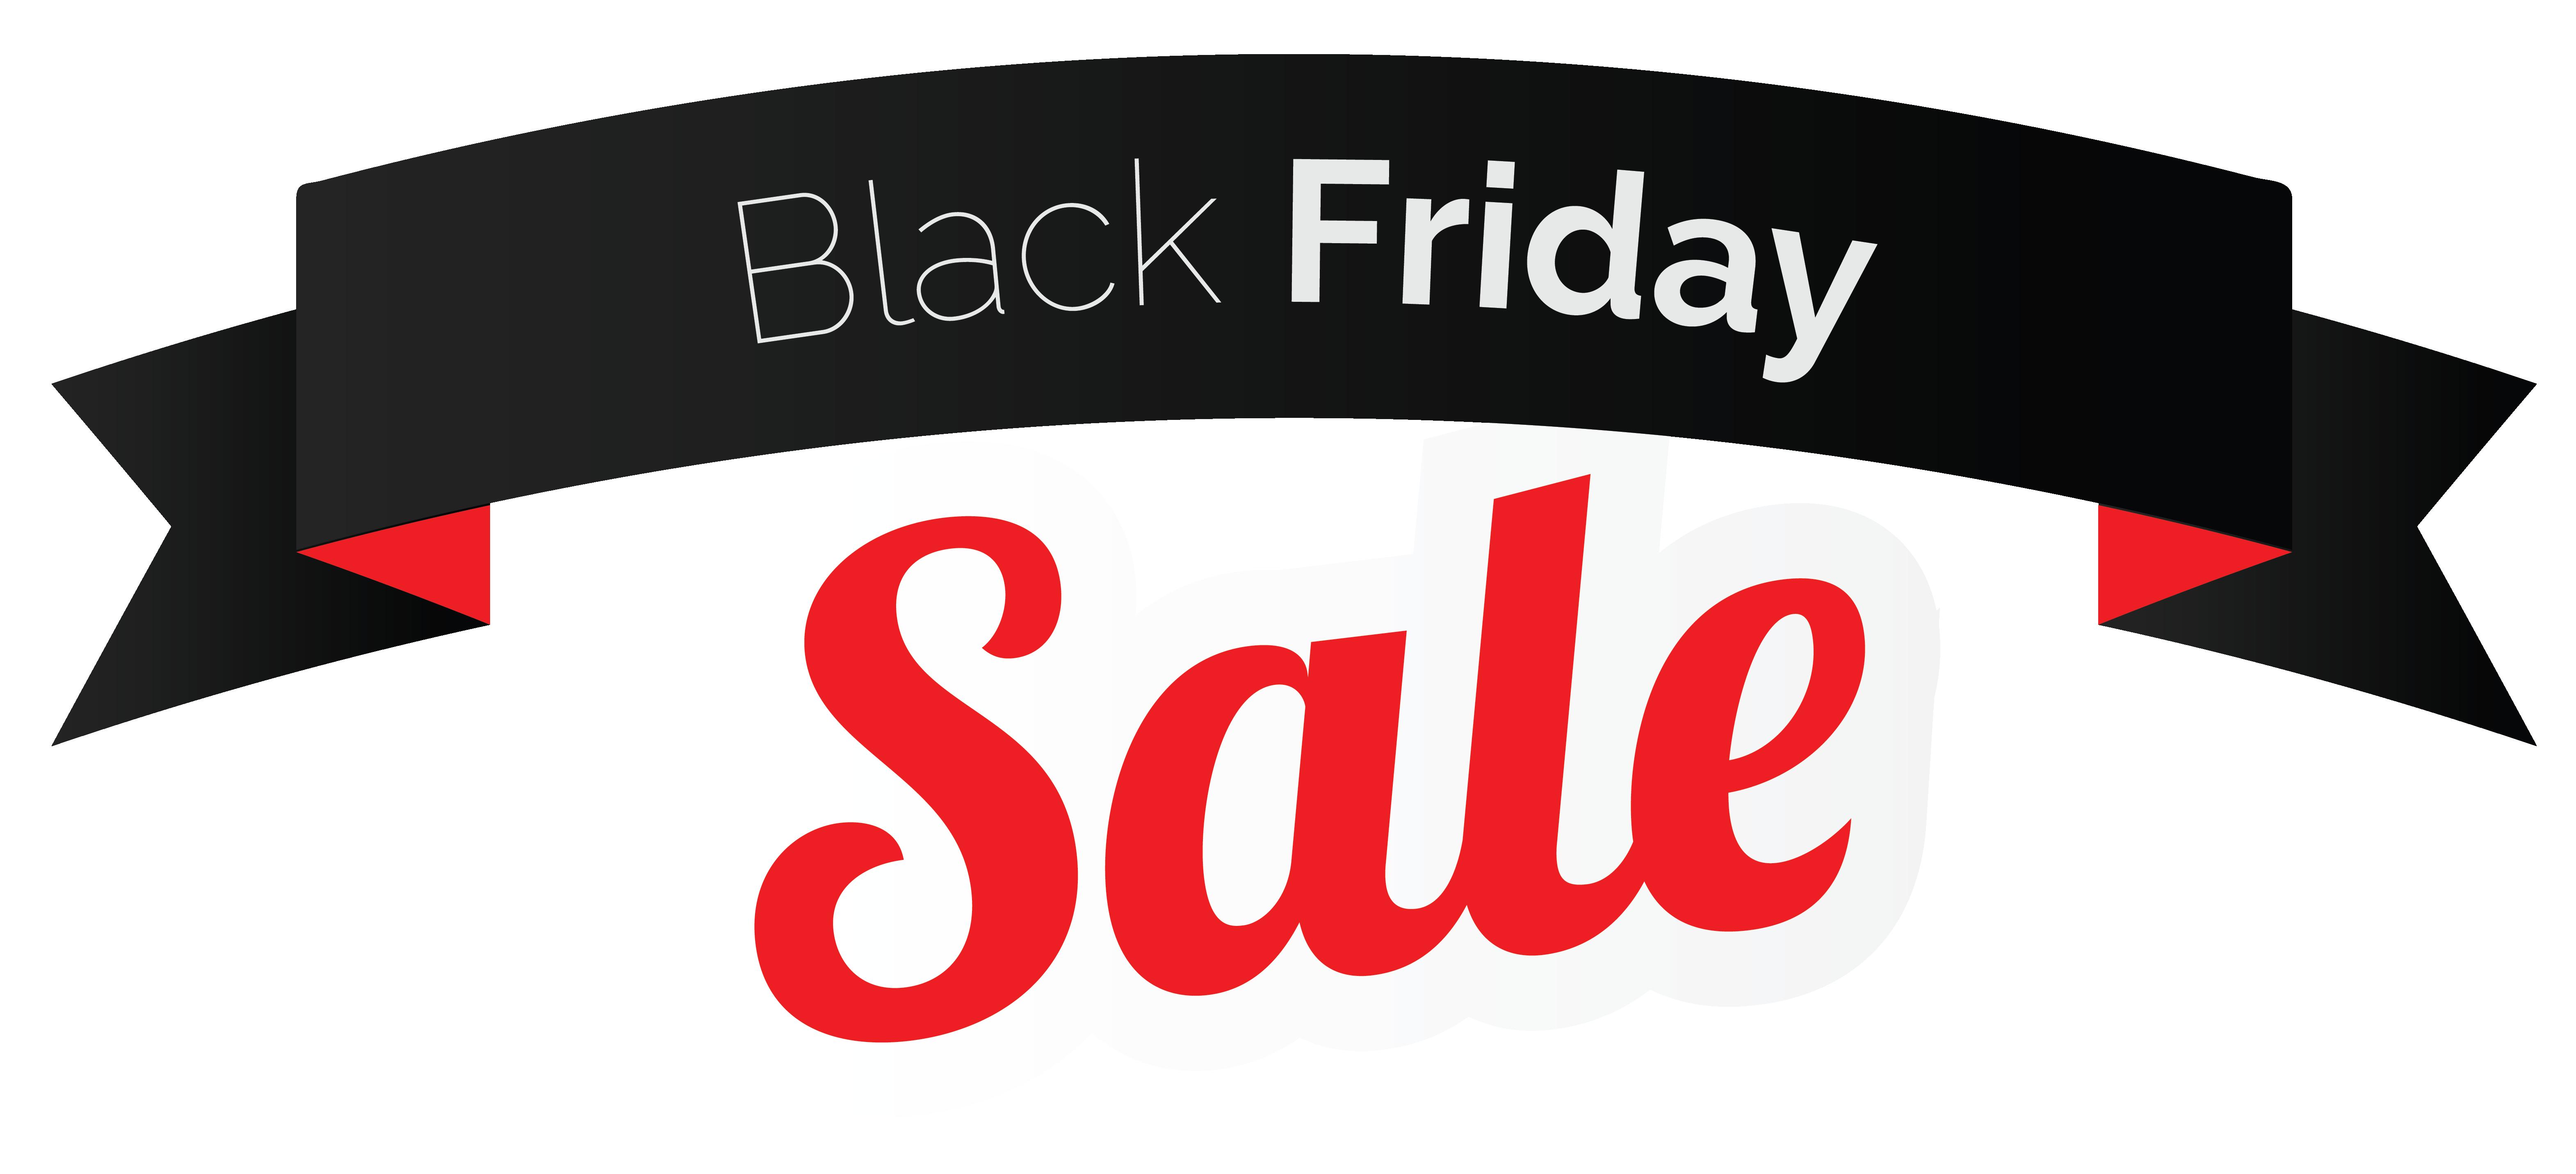 Black Friday Sale Banner PNG Clipart Image.